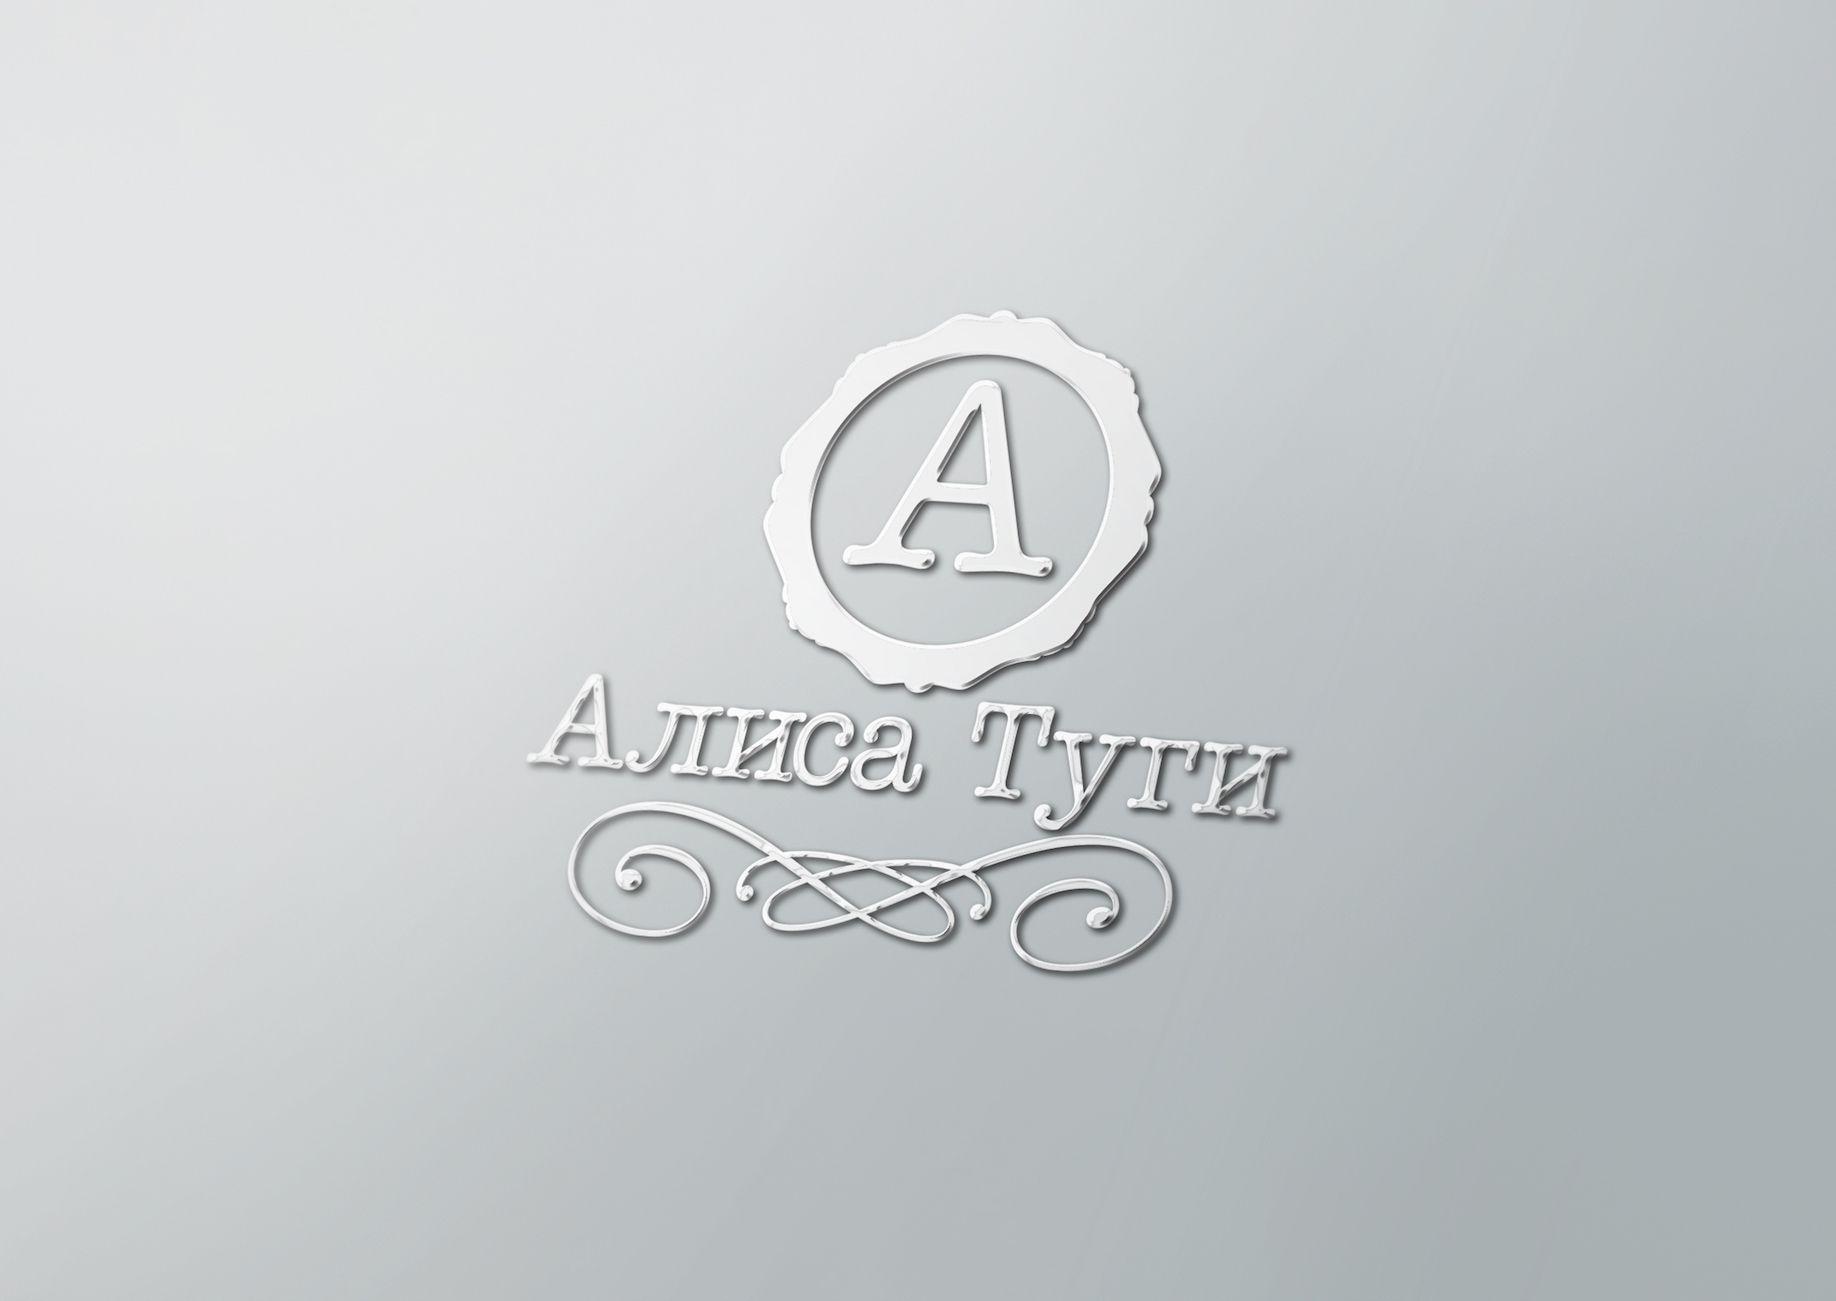 Логотип для визажиста - дизайнер Pulkov